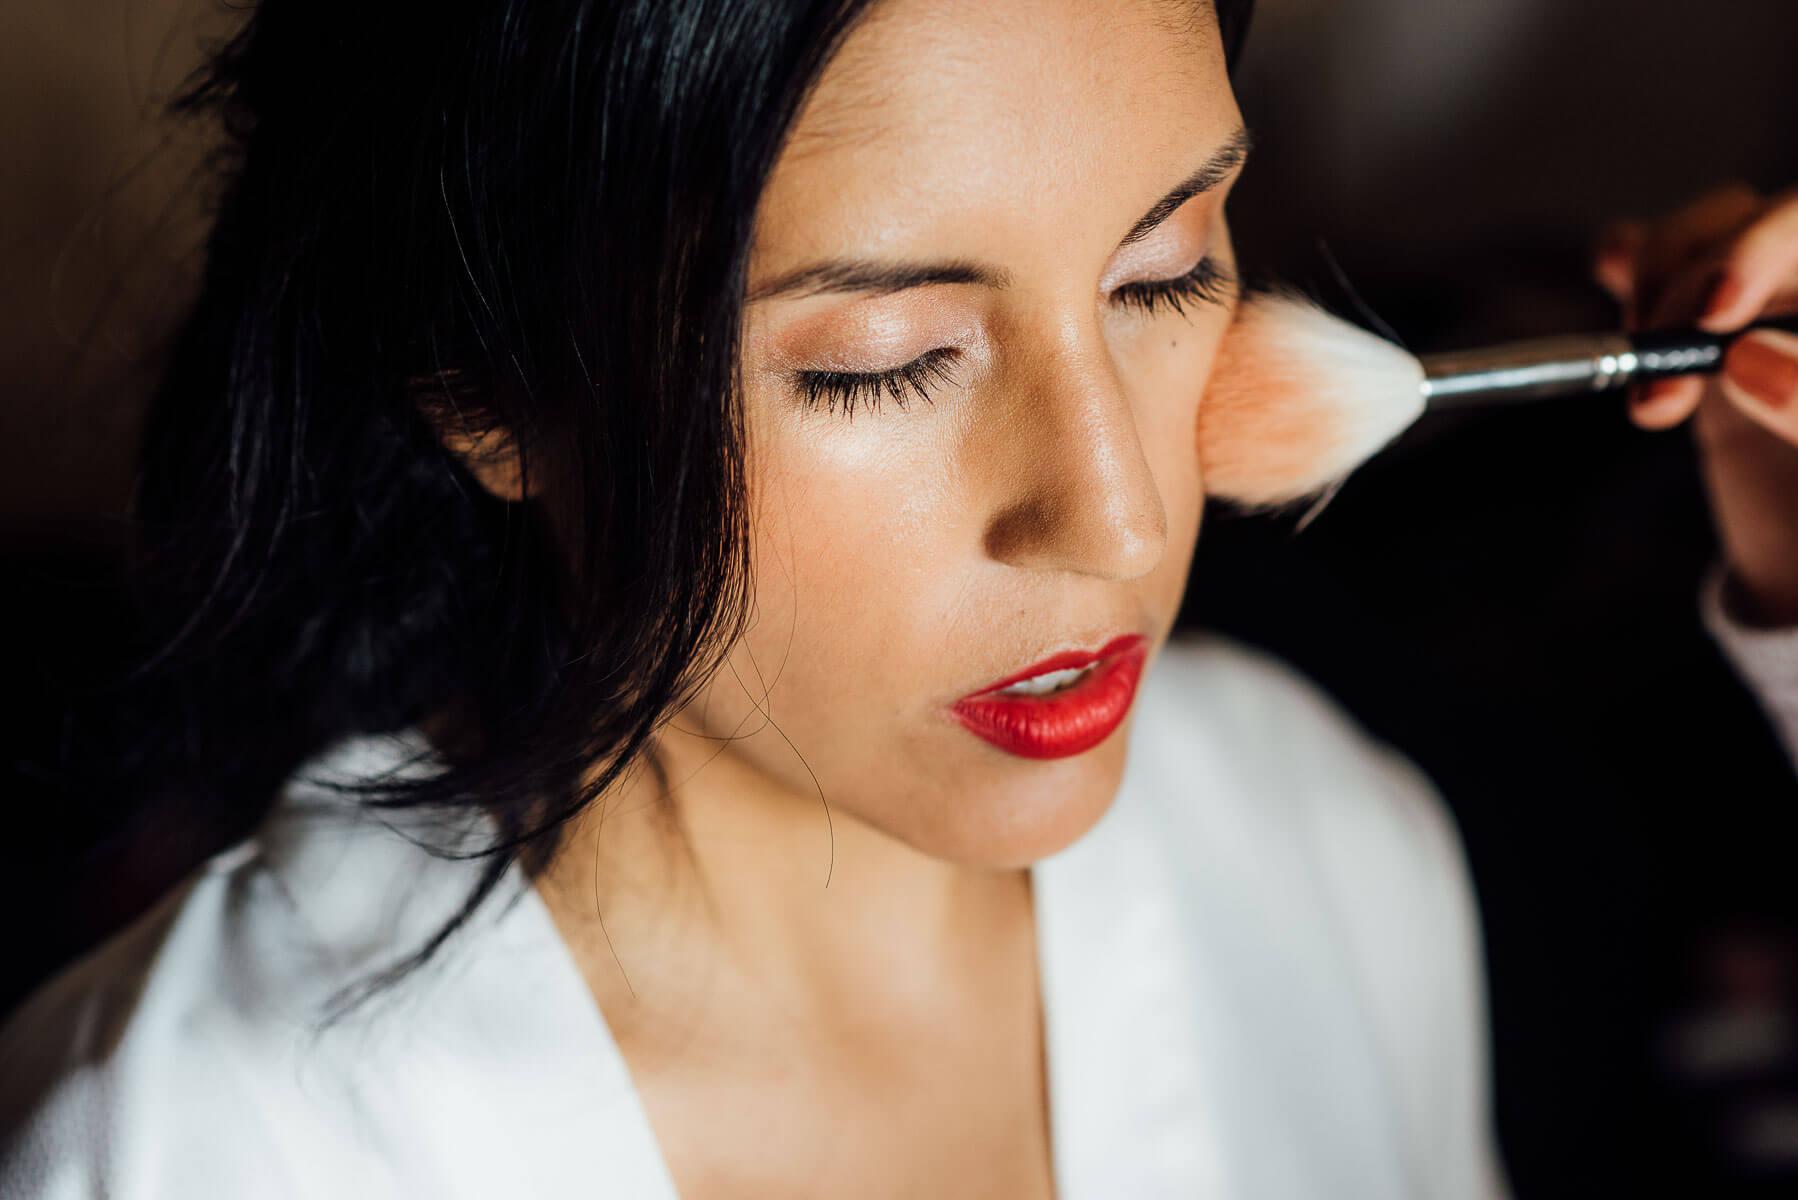 Boda Carla & Sergi maquillaje novia - Manel Tamayo - fotografo de boda